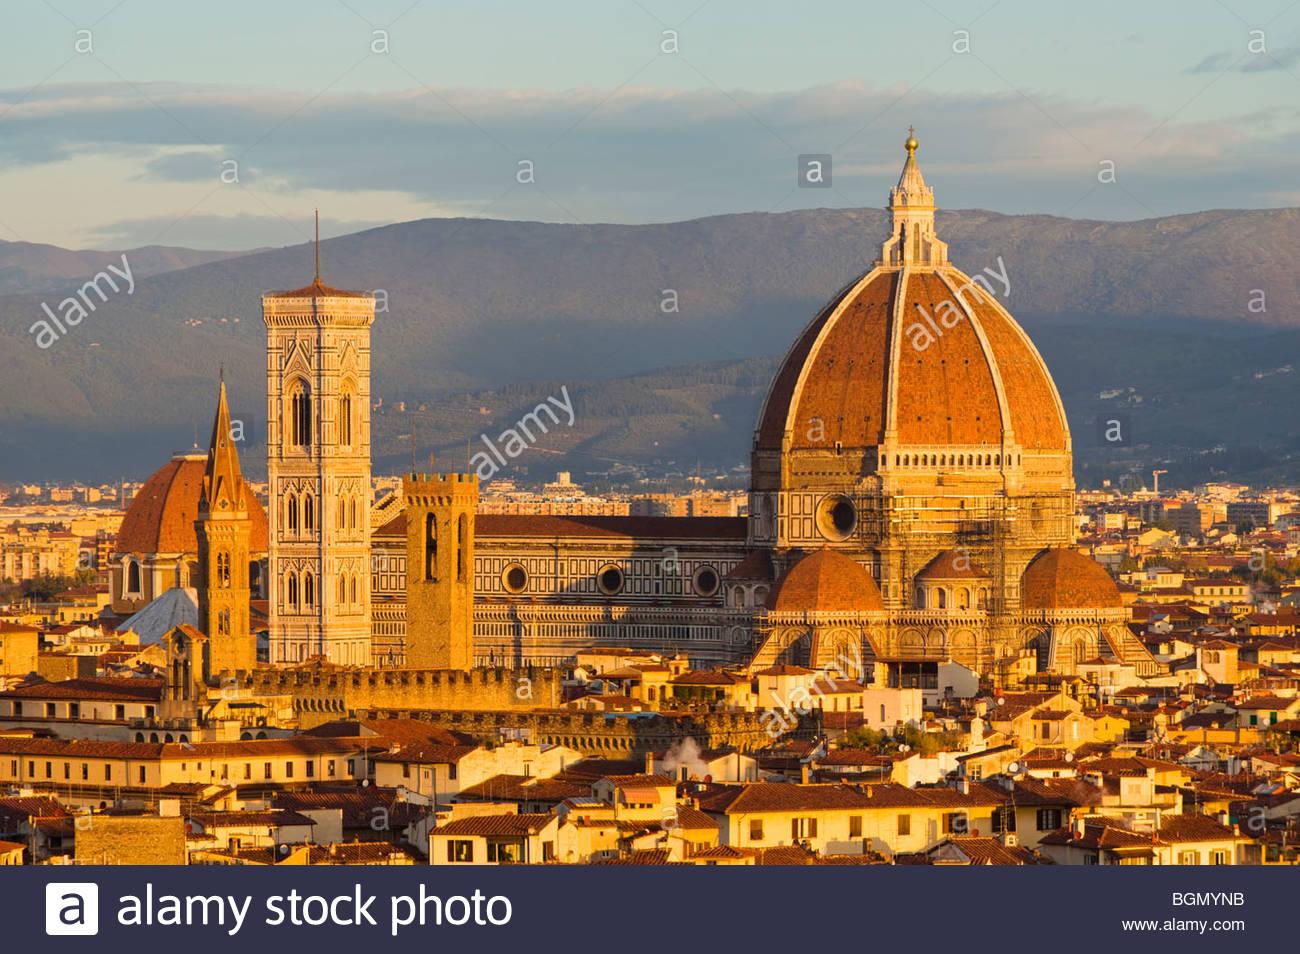 The Duomo (Basilica di Santa Maria del Fiore), Florence, Tuscany, Italy. - Stock Image